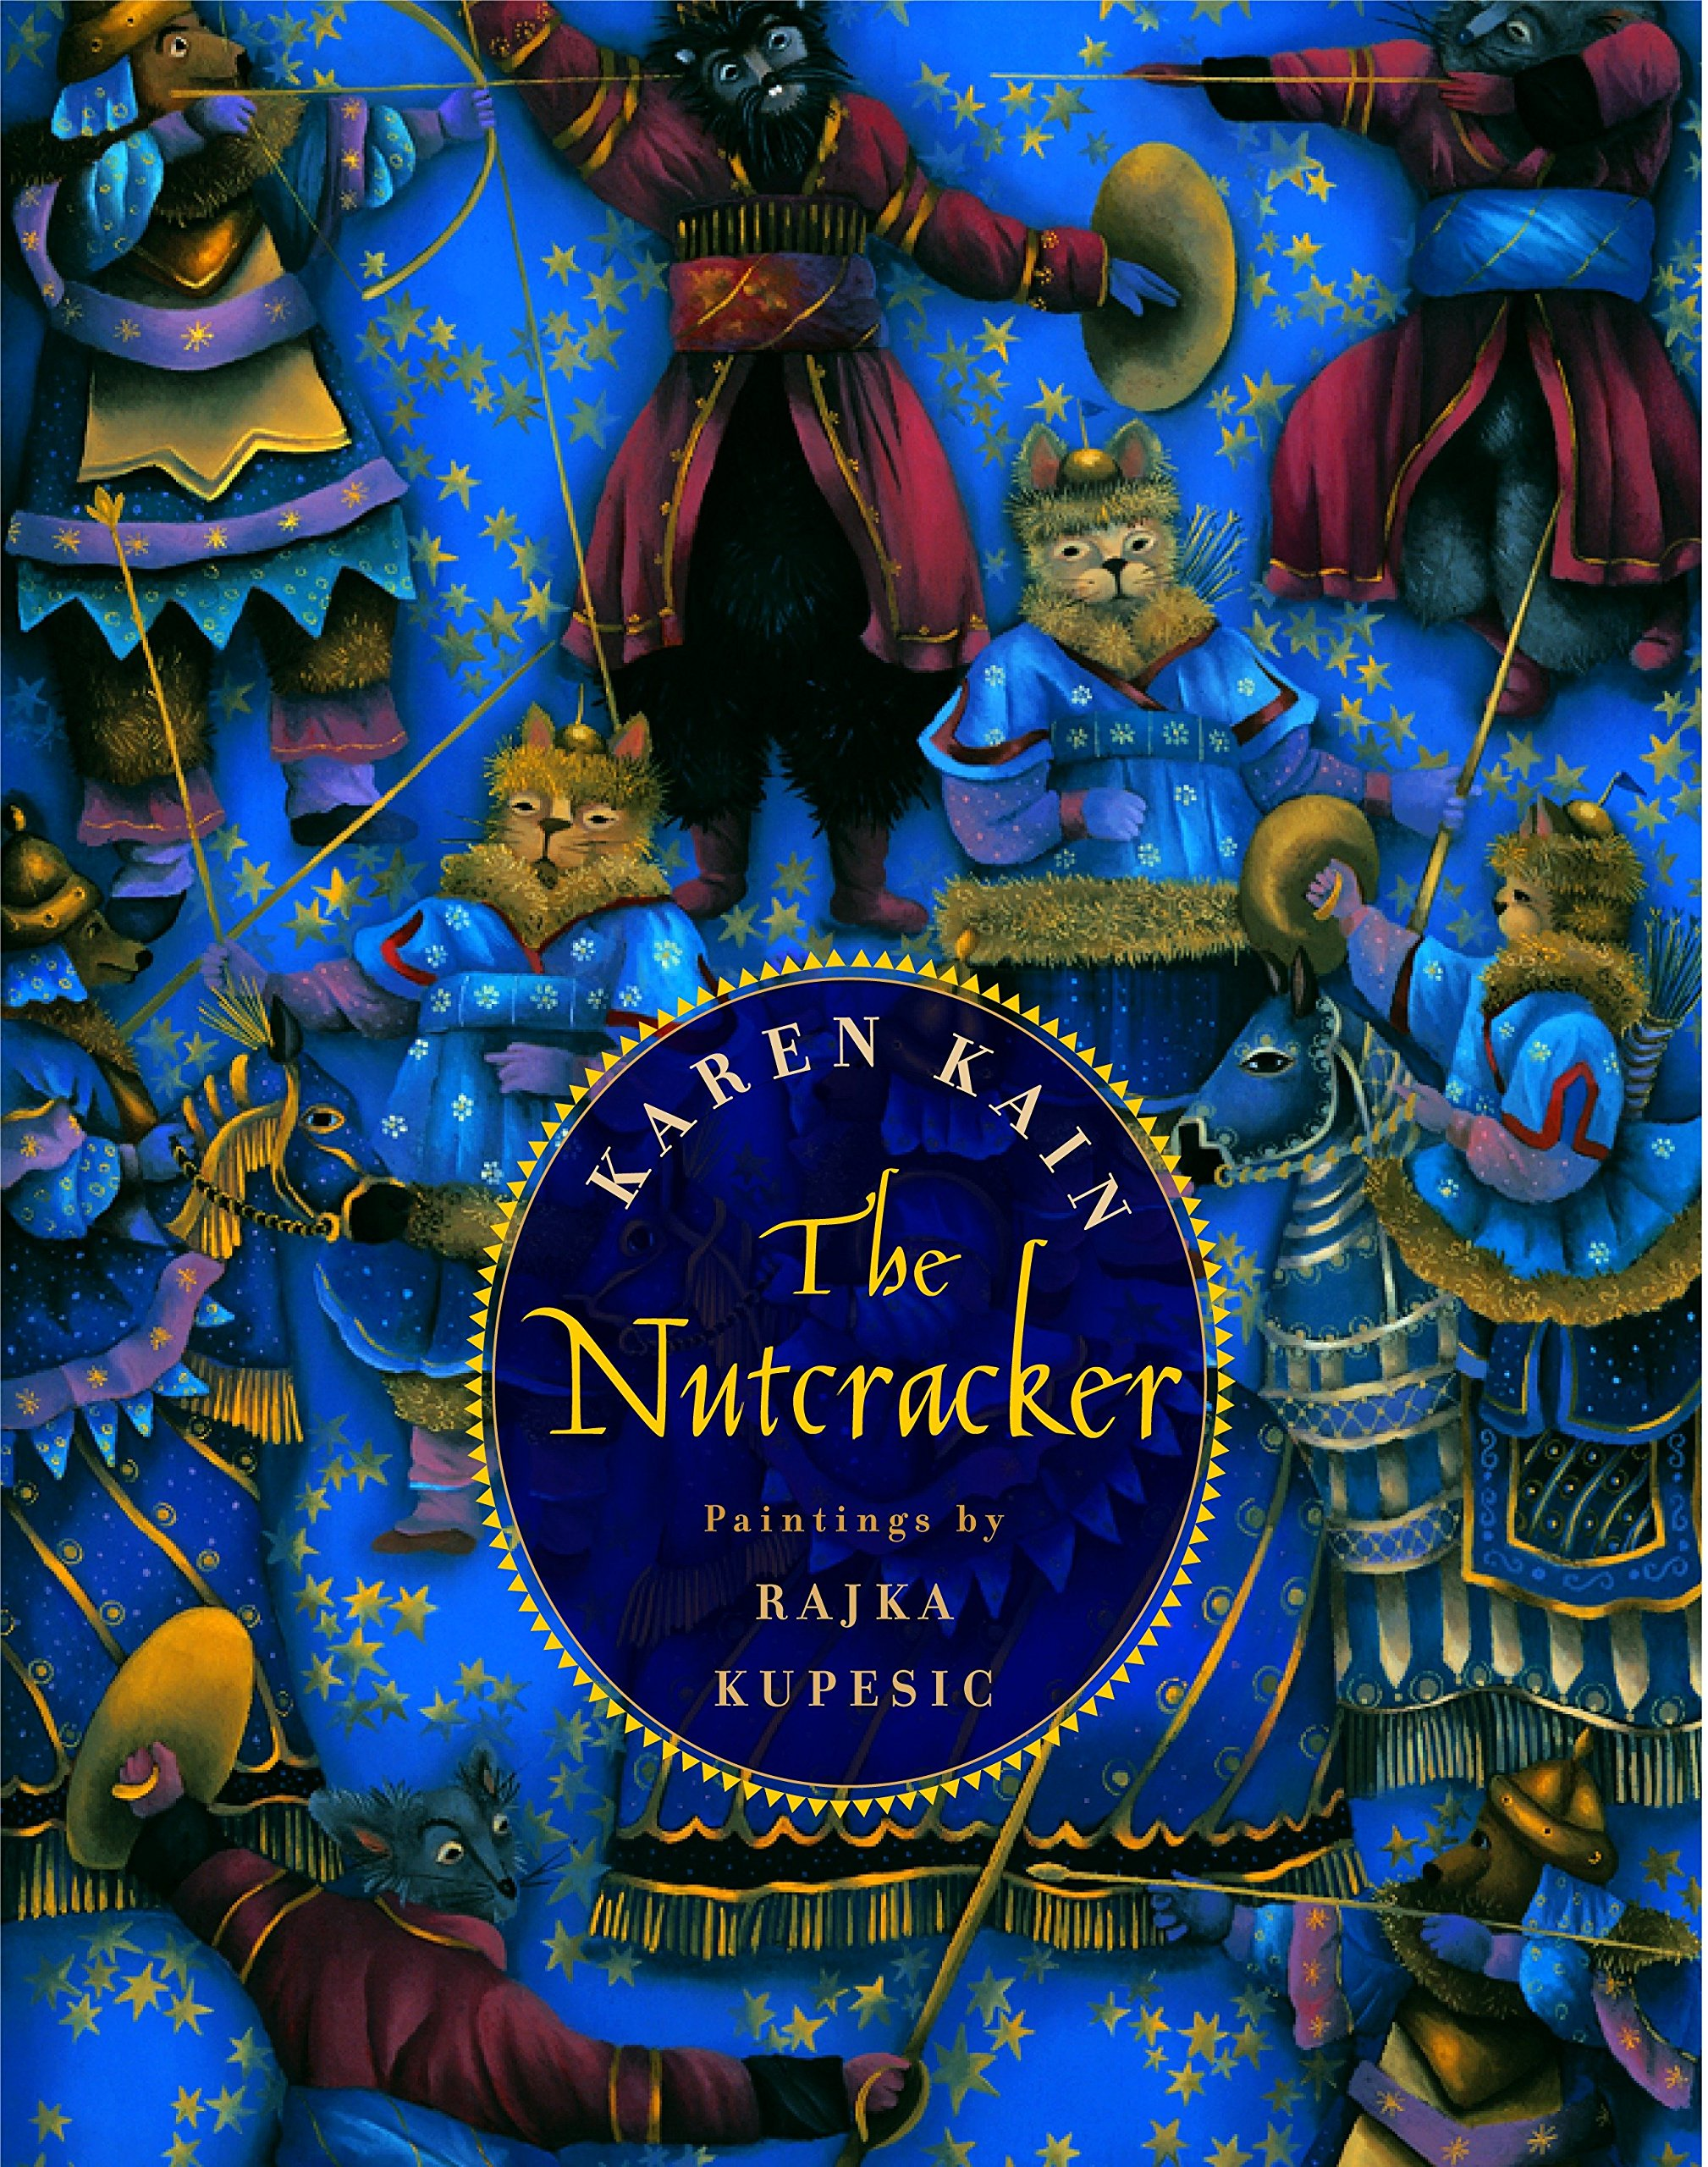 Nutcracker print featuring MARIE